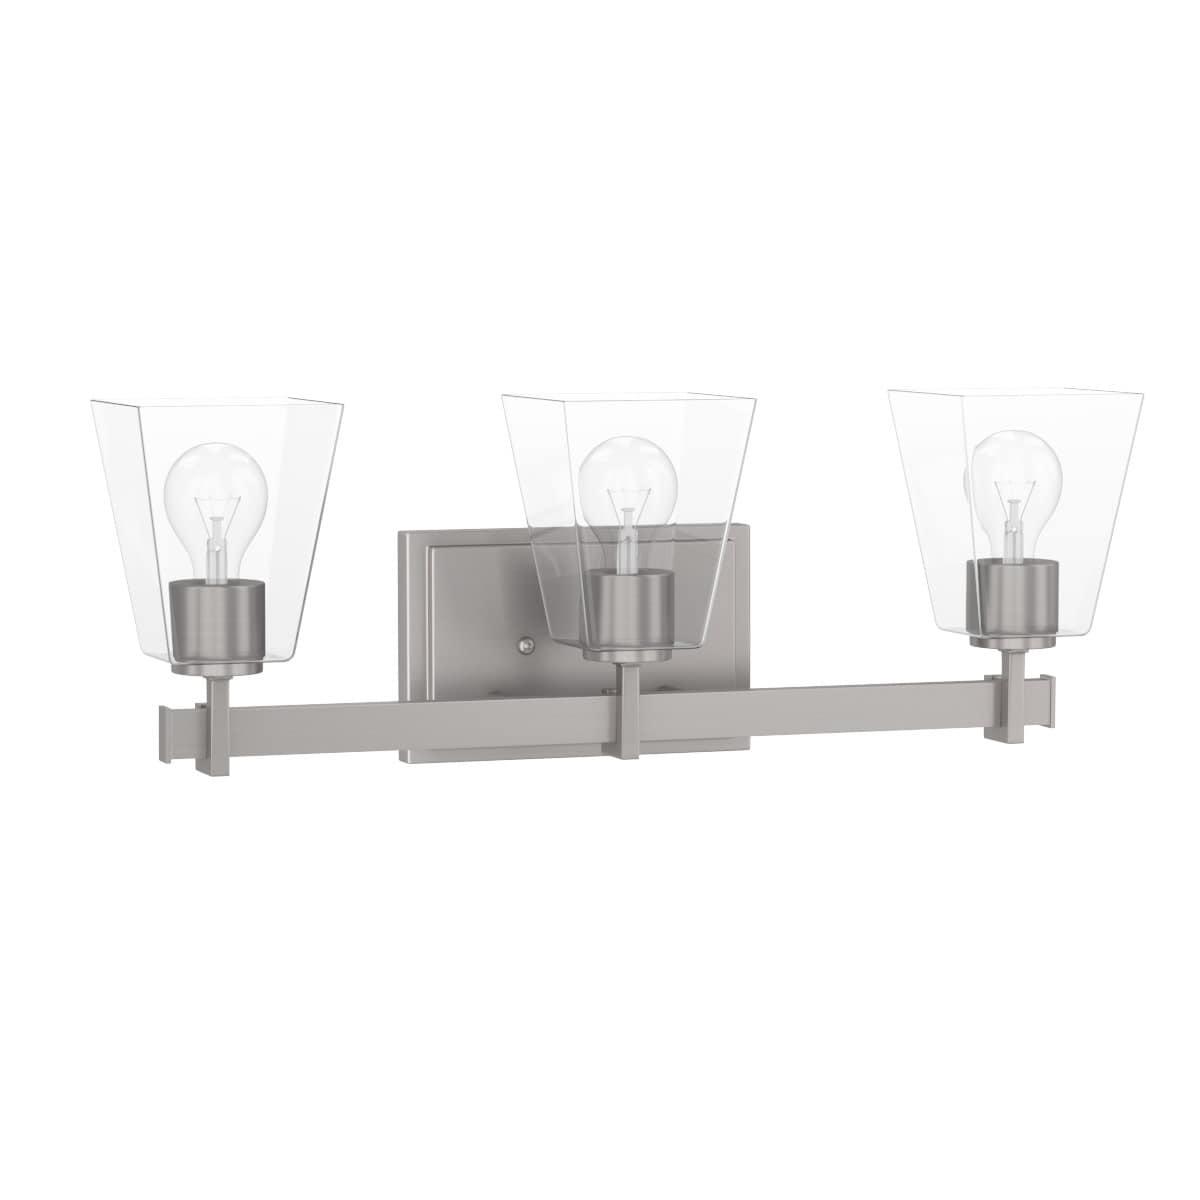 Park harbor phvl3023 hoxton 3 light 22 3 8 wide bathroom vanity light with clear glass shades